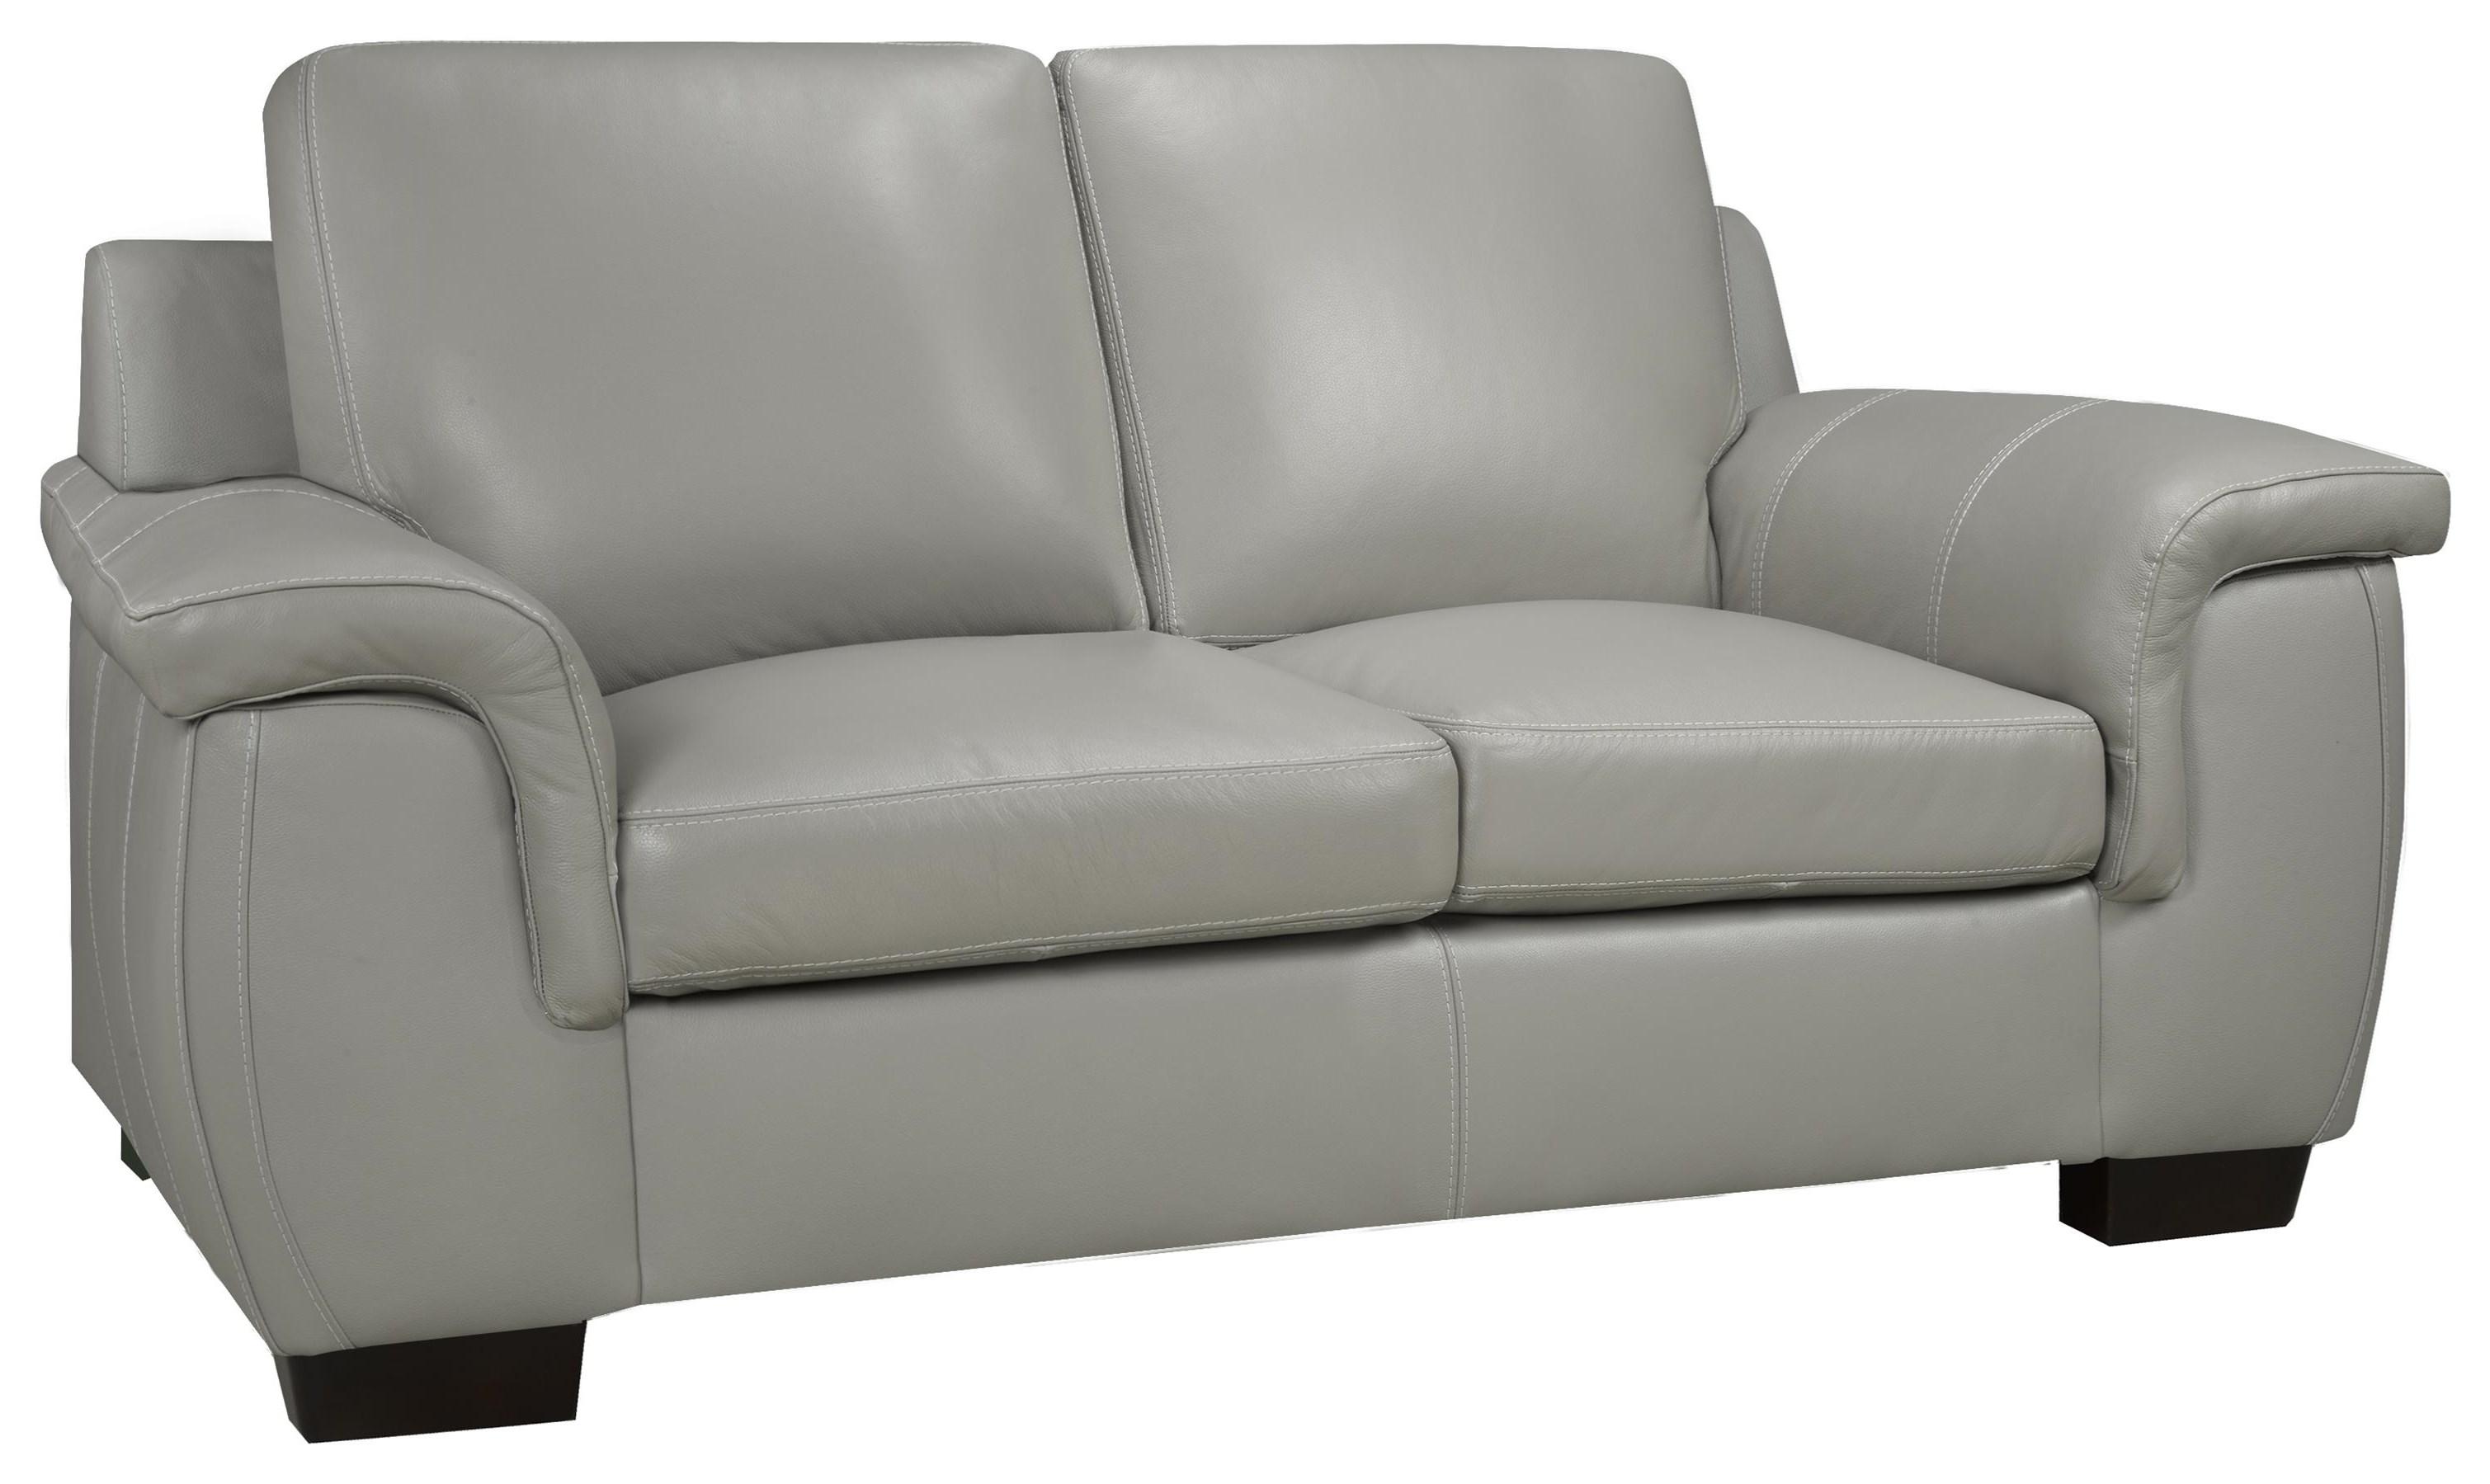 Brisbane Loveseat - Lthr /cloud Gray Al by Leather Living at Stoney Creek Furniture